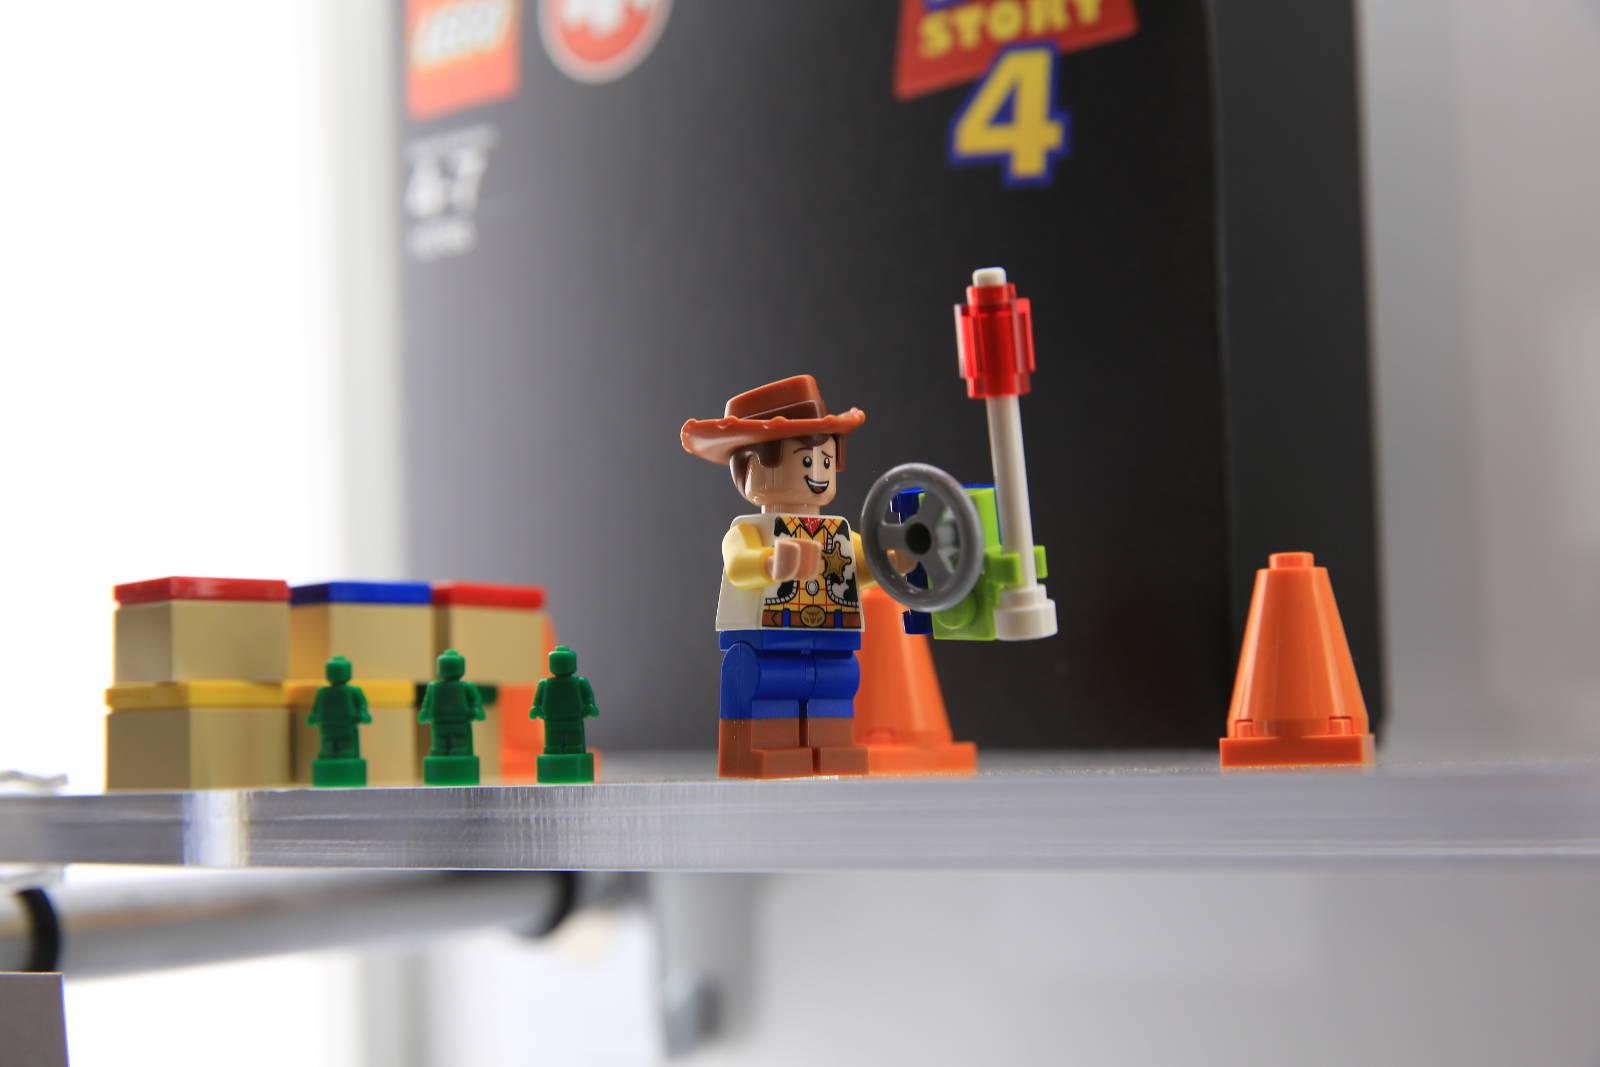 Woodys Rv World >> Toy Fair 2019: LEGO Toy Story 4 Preview - FBTB